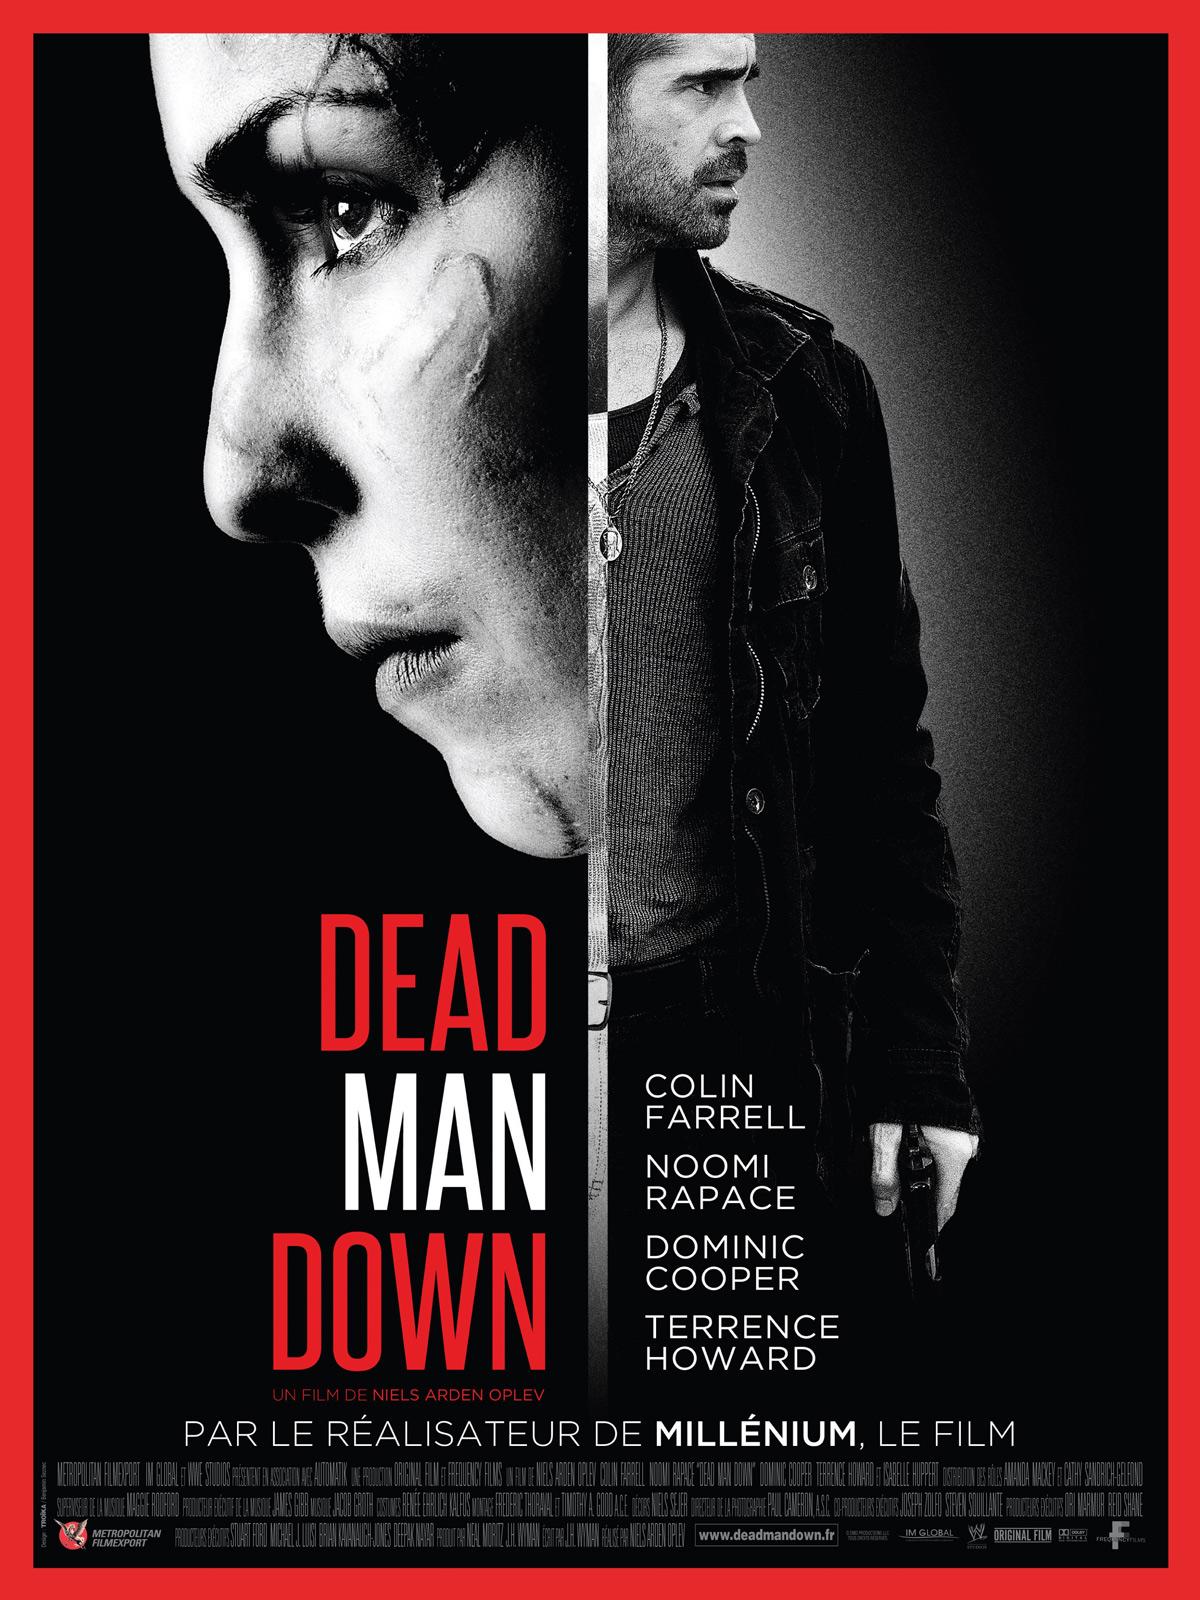 Dead Man Down ddl